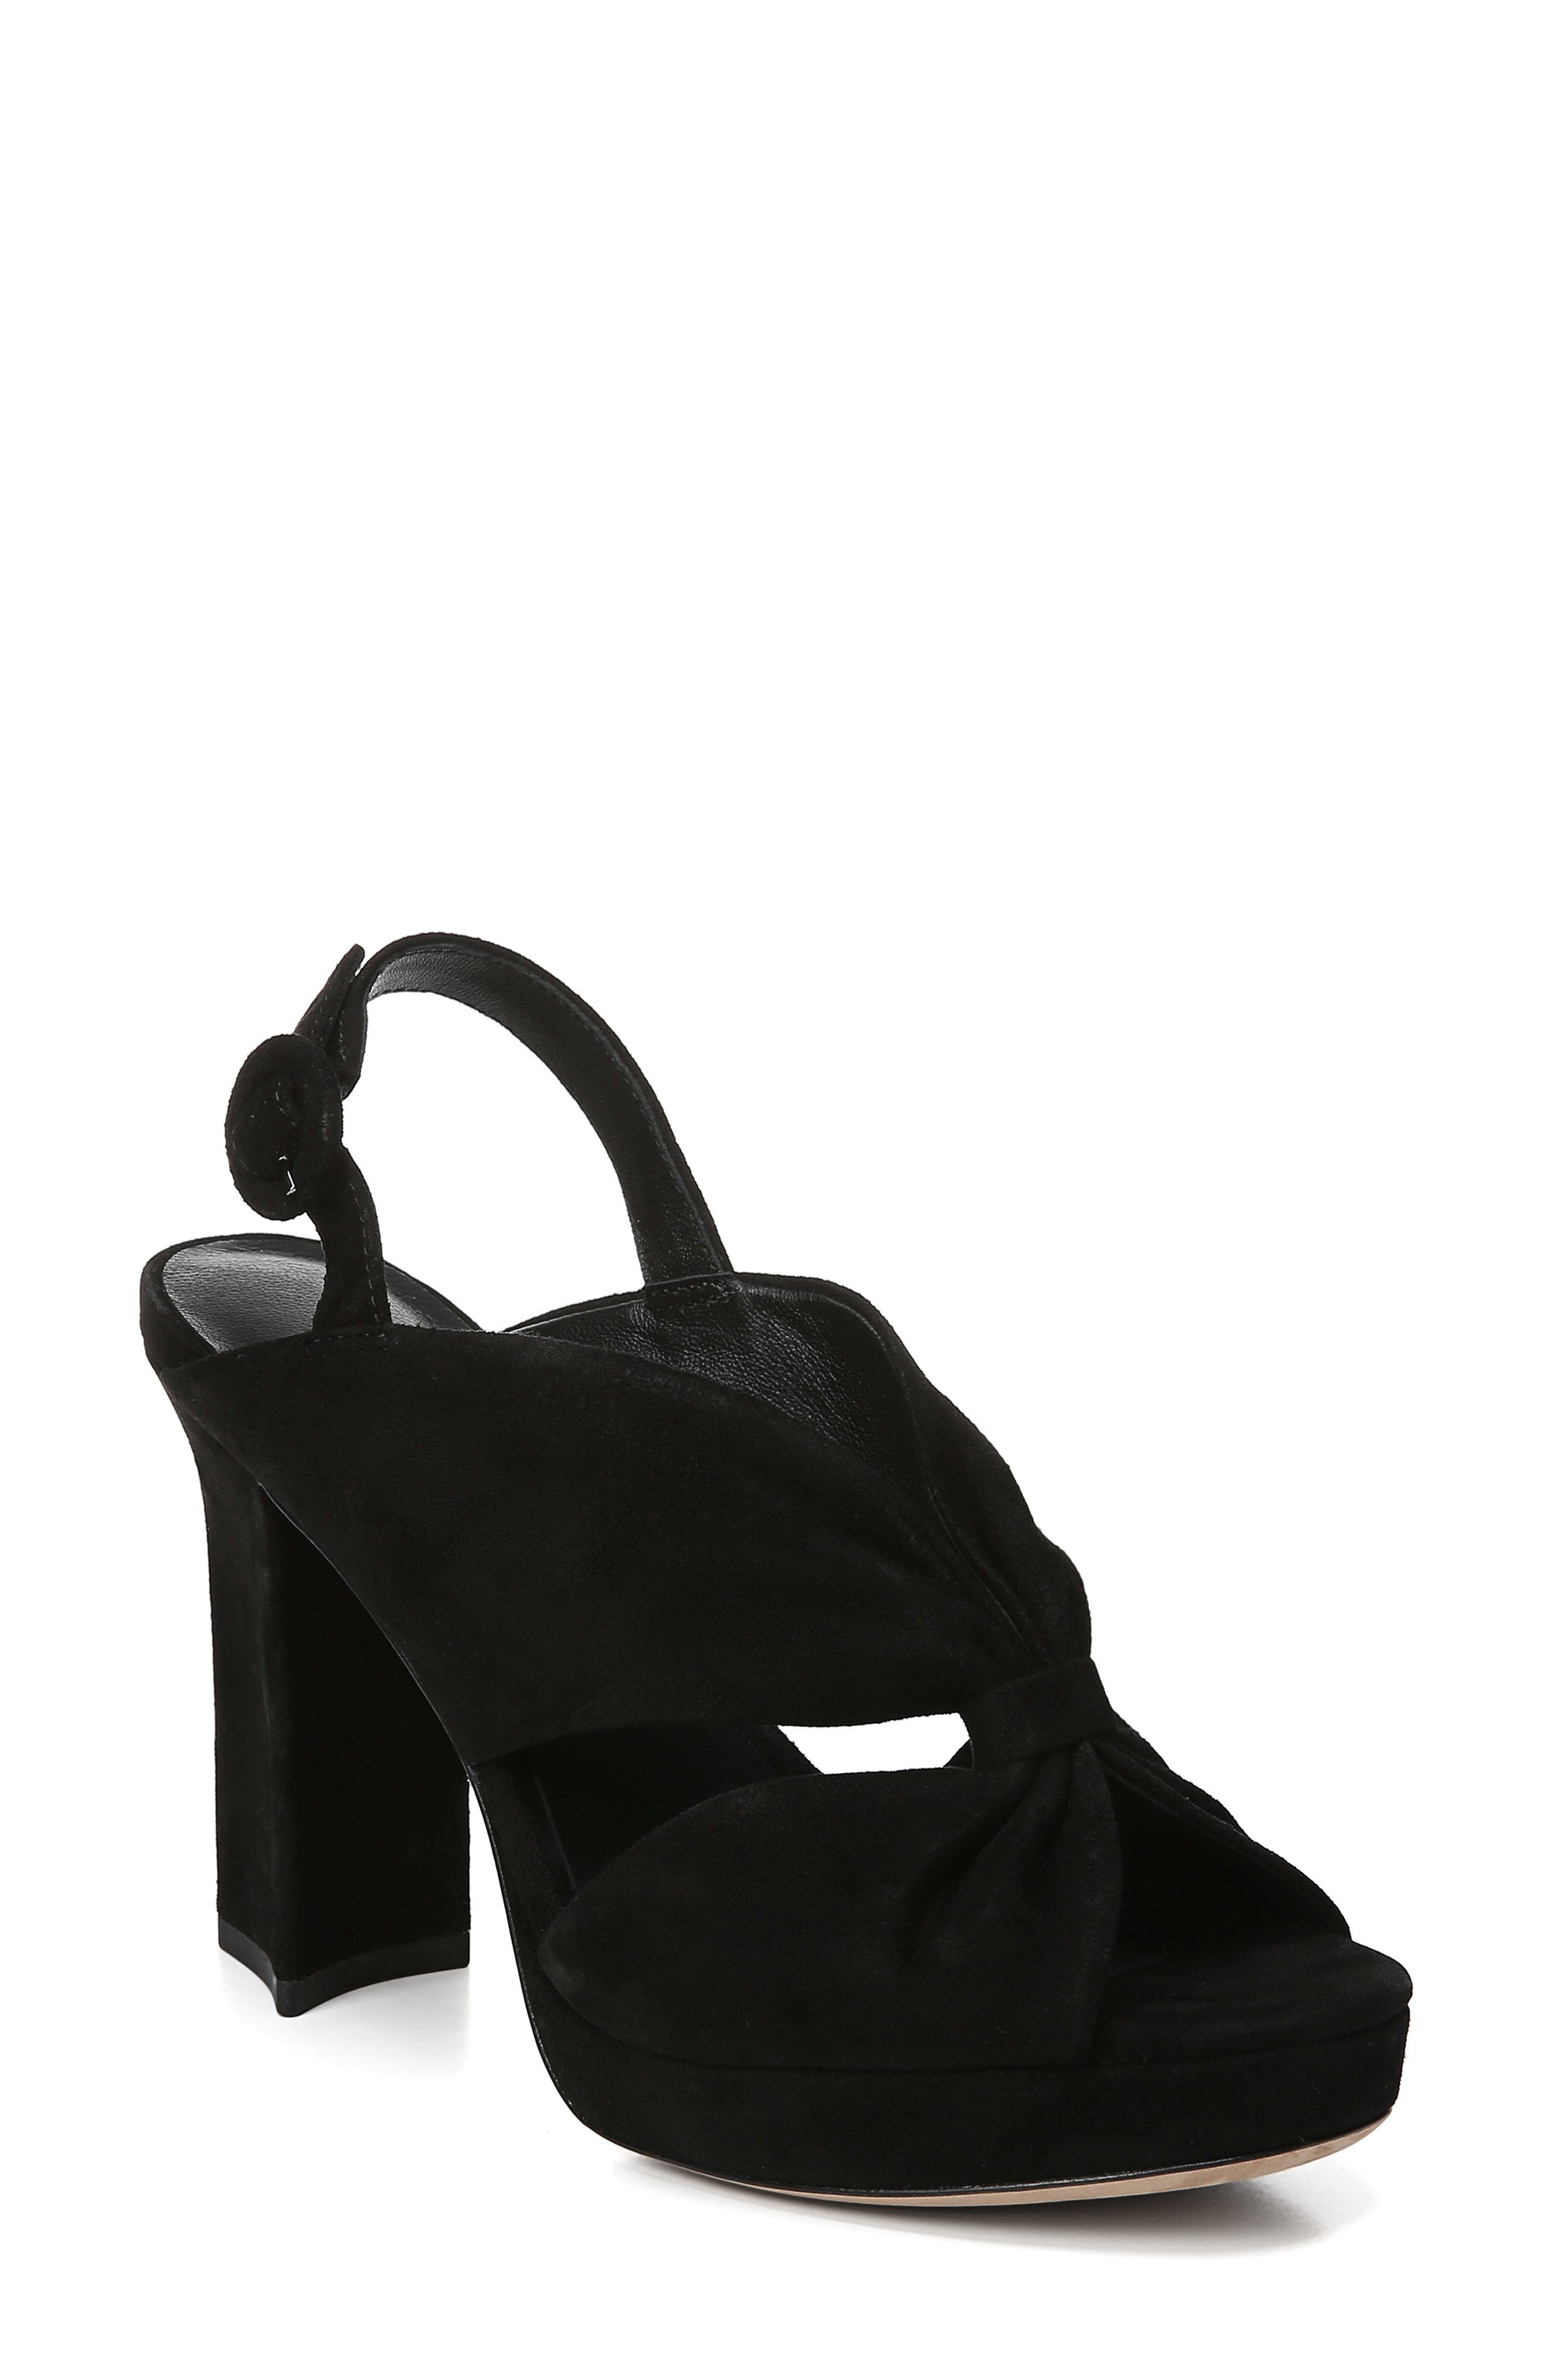 DIANE VON FURSTENBERG Heidi Platform Sandal, Main, color, BLACK